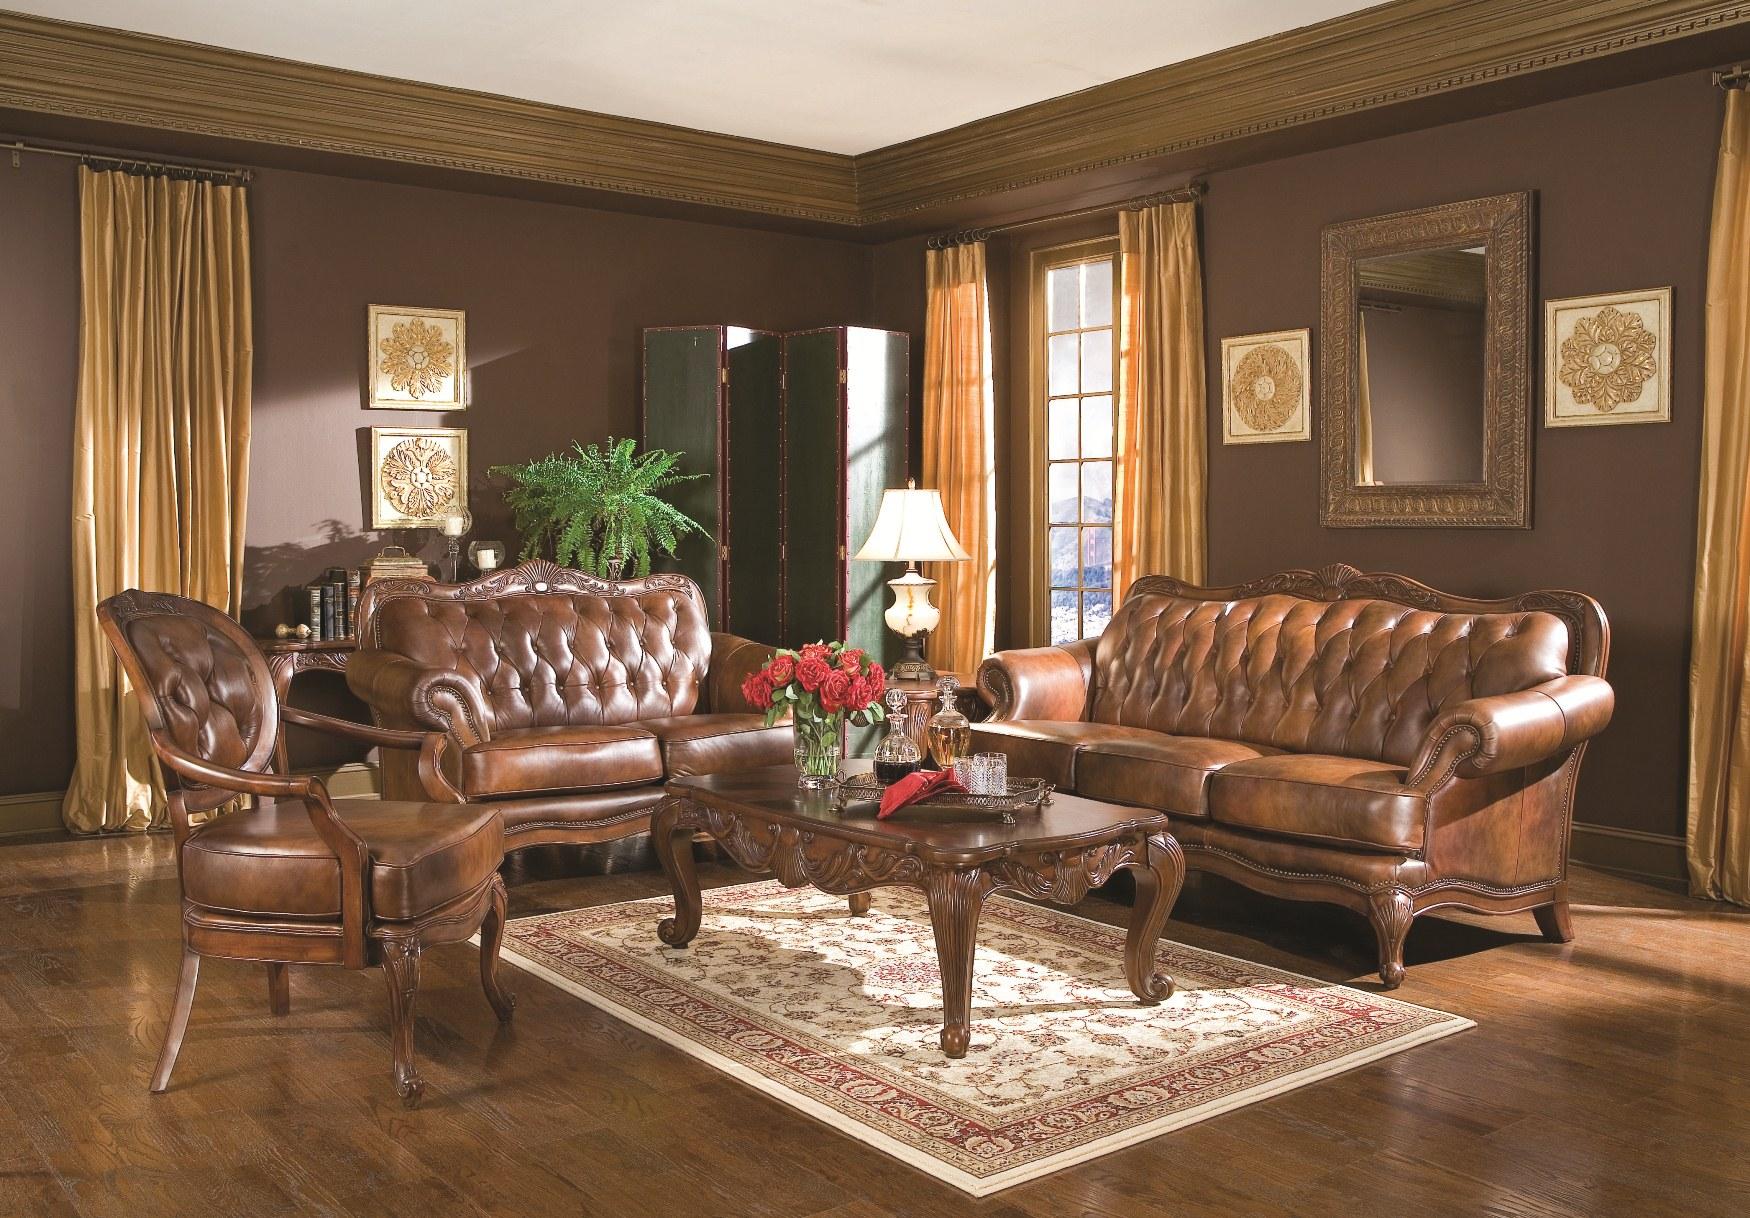 Furniture > Living Room Furniture > Living Room > Victorian Living